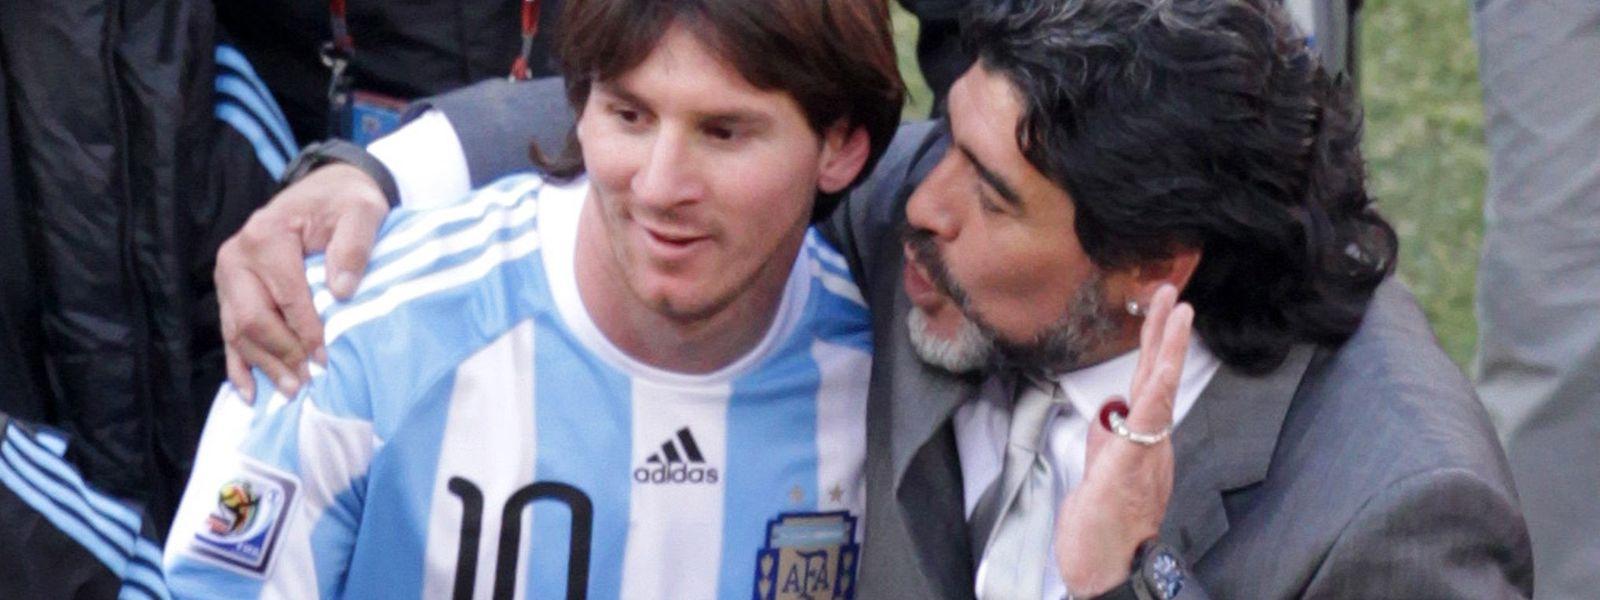 Messi e Diego Maradona